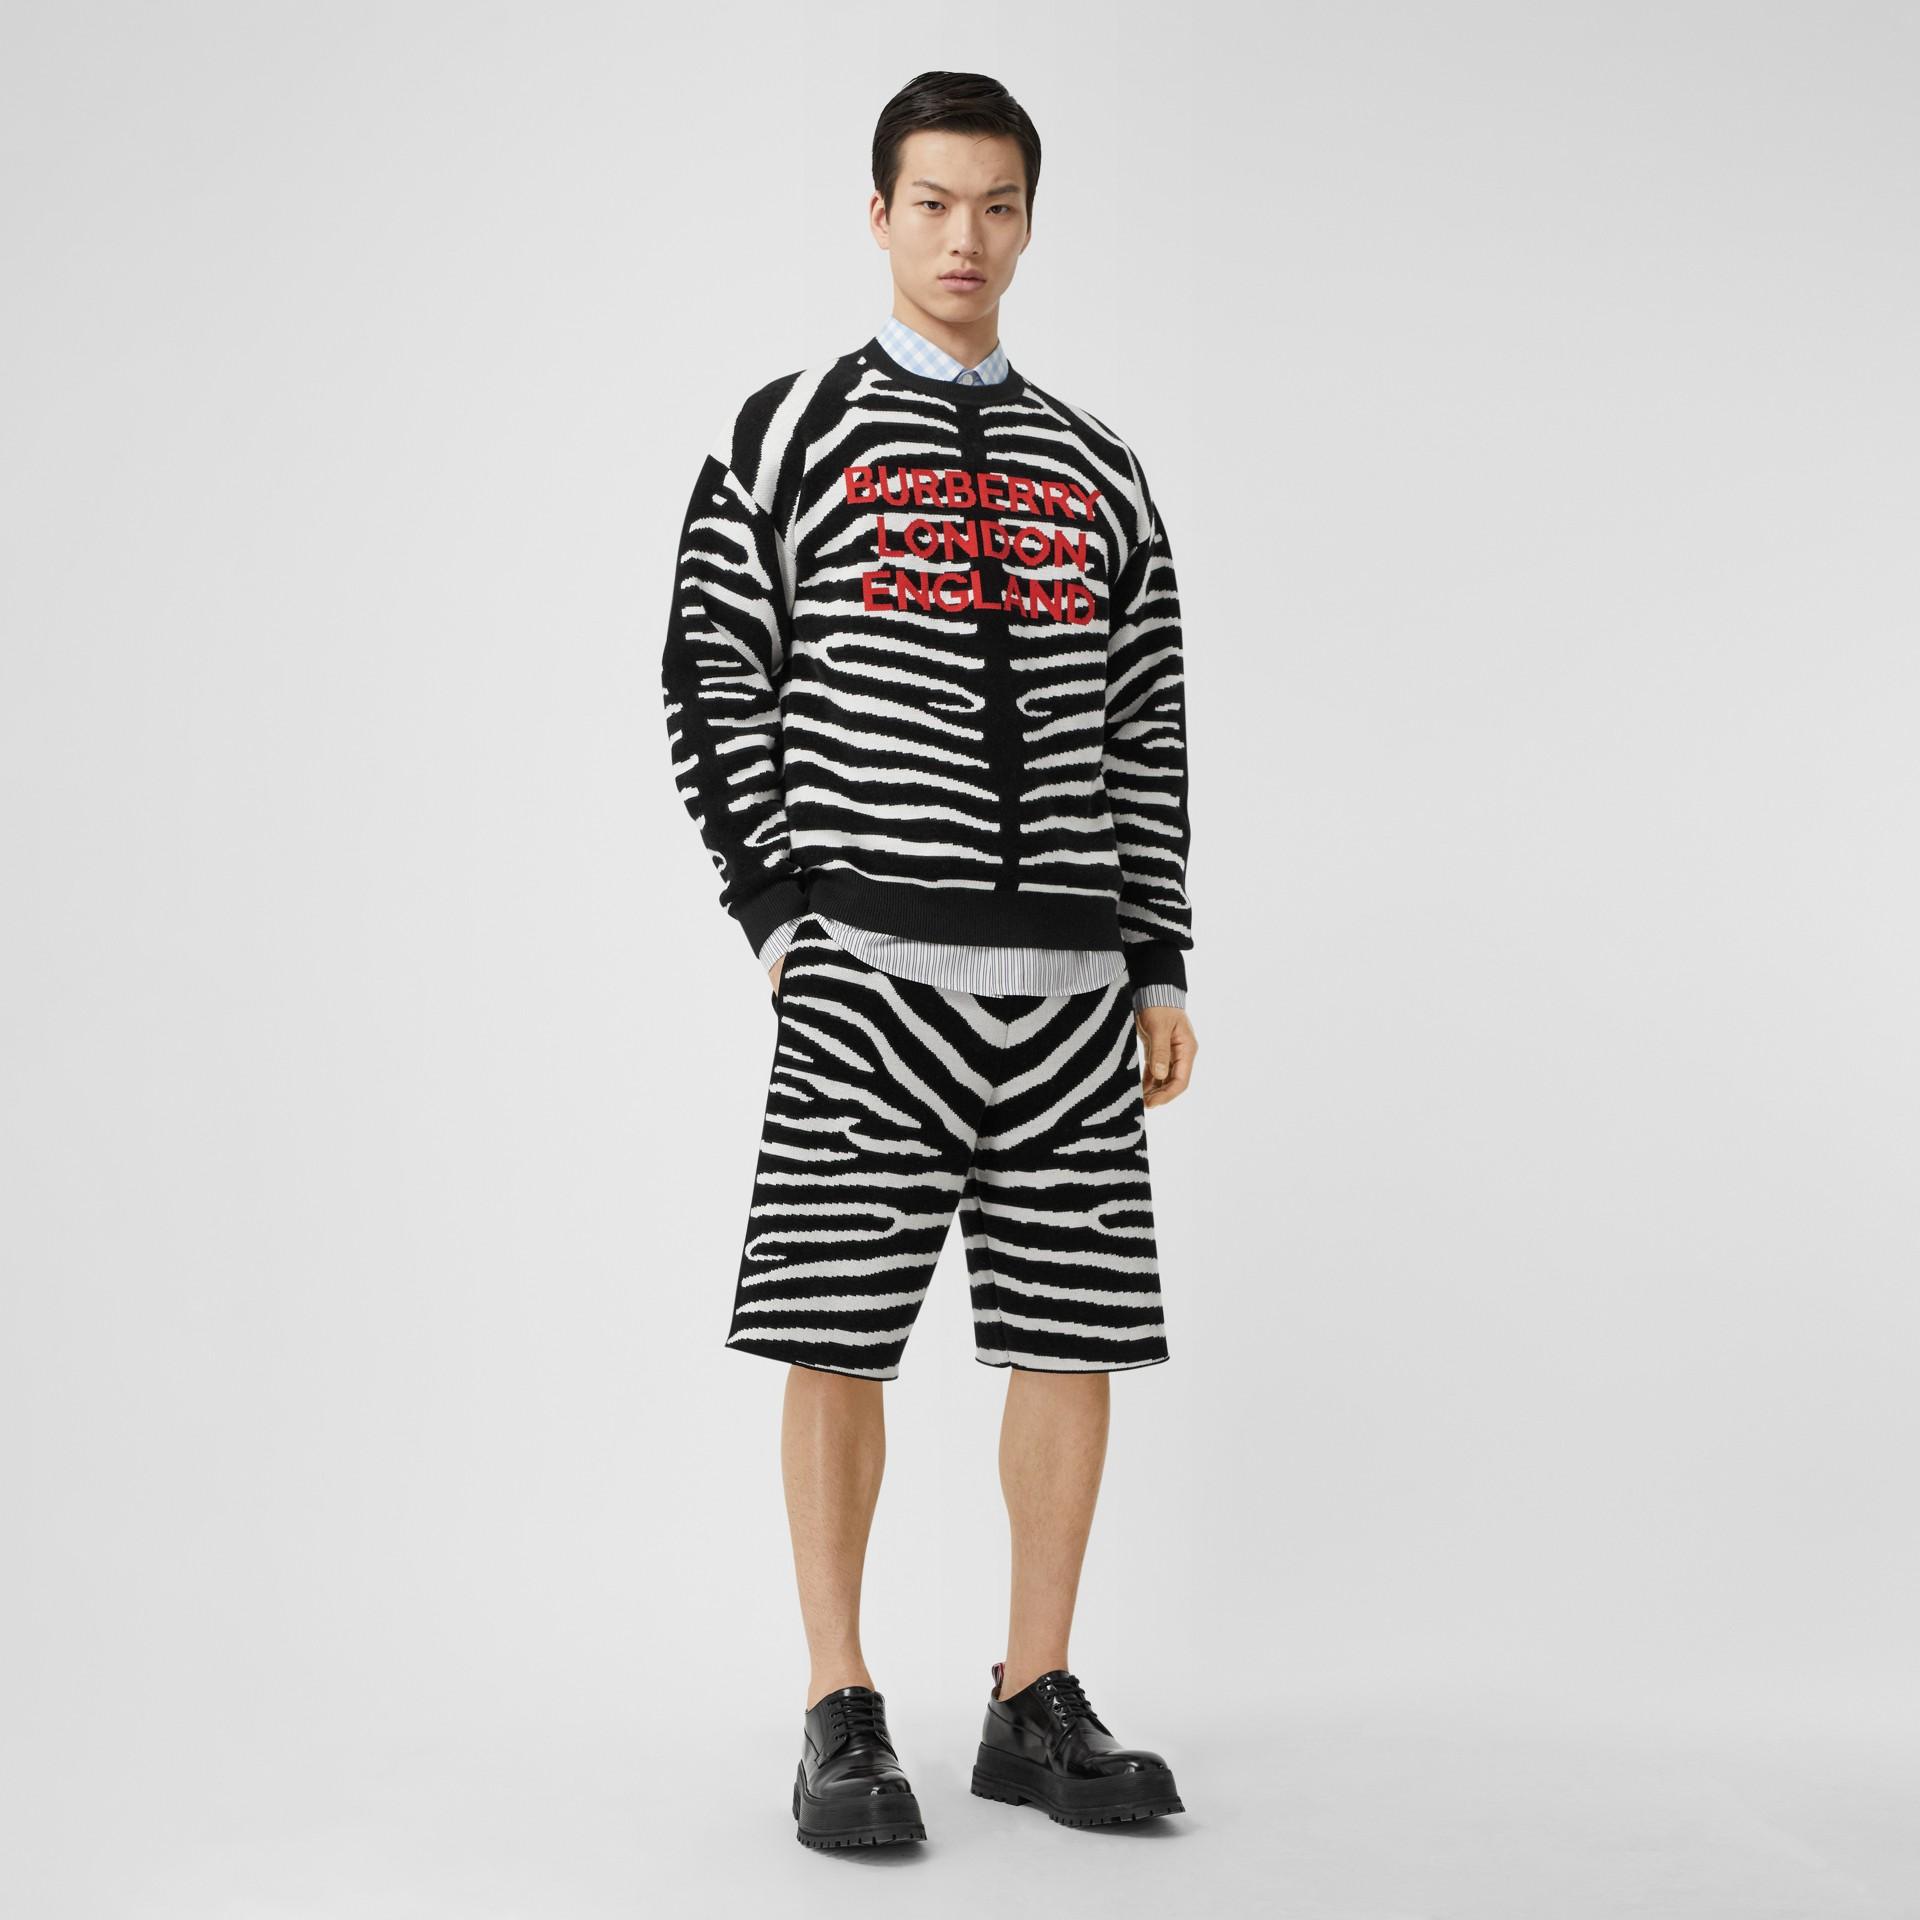 Zebra Wool Blend Jacquard Drawcord Shorts in Black | Burberry United Kingdom - gallery image 0